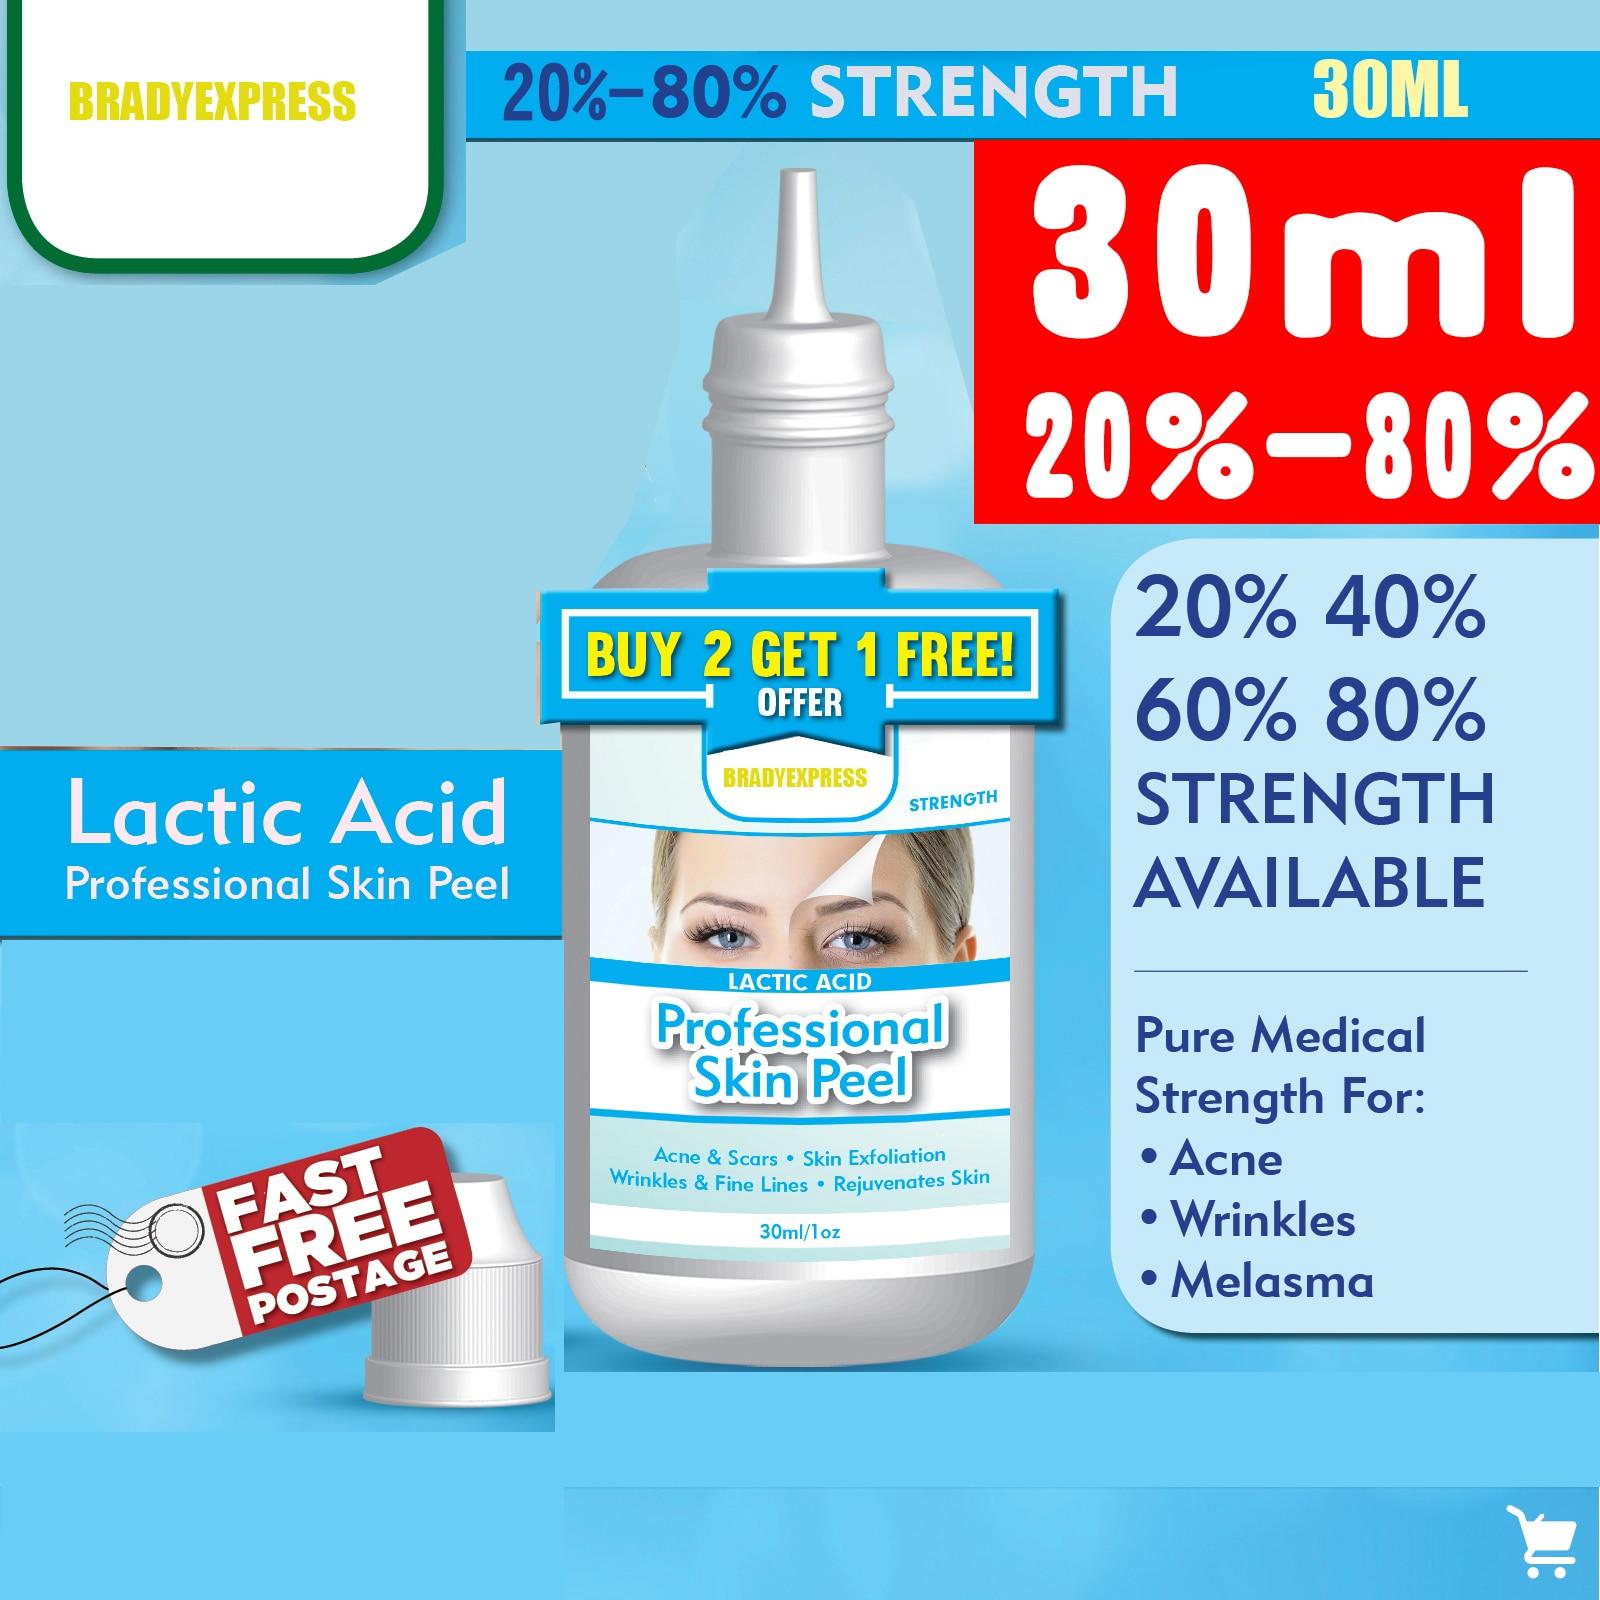 30ML LACTIC Acid Skin Peel For Acne Wrinkles Melasma Age Spots 20% 40% 60% 80%